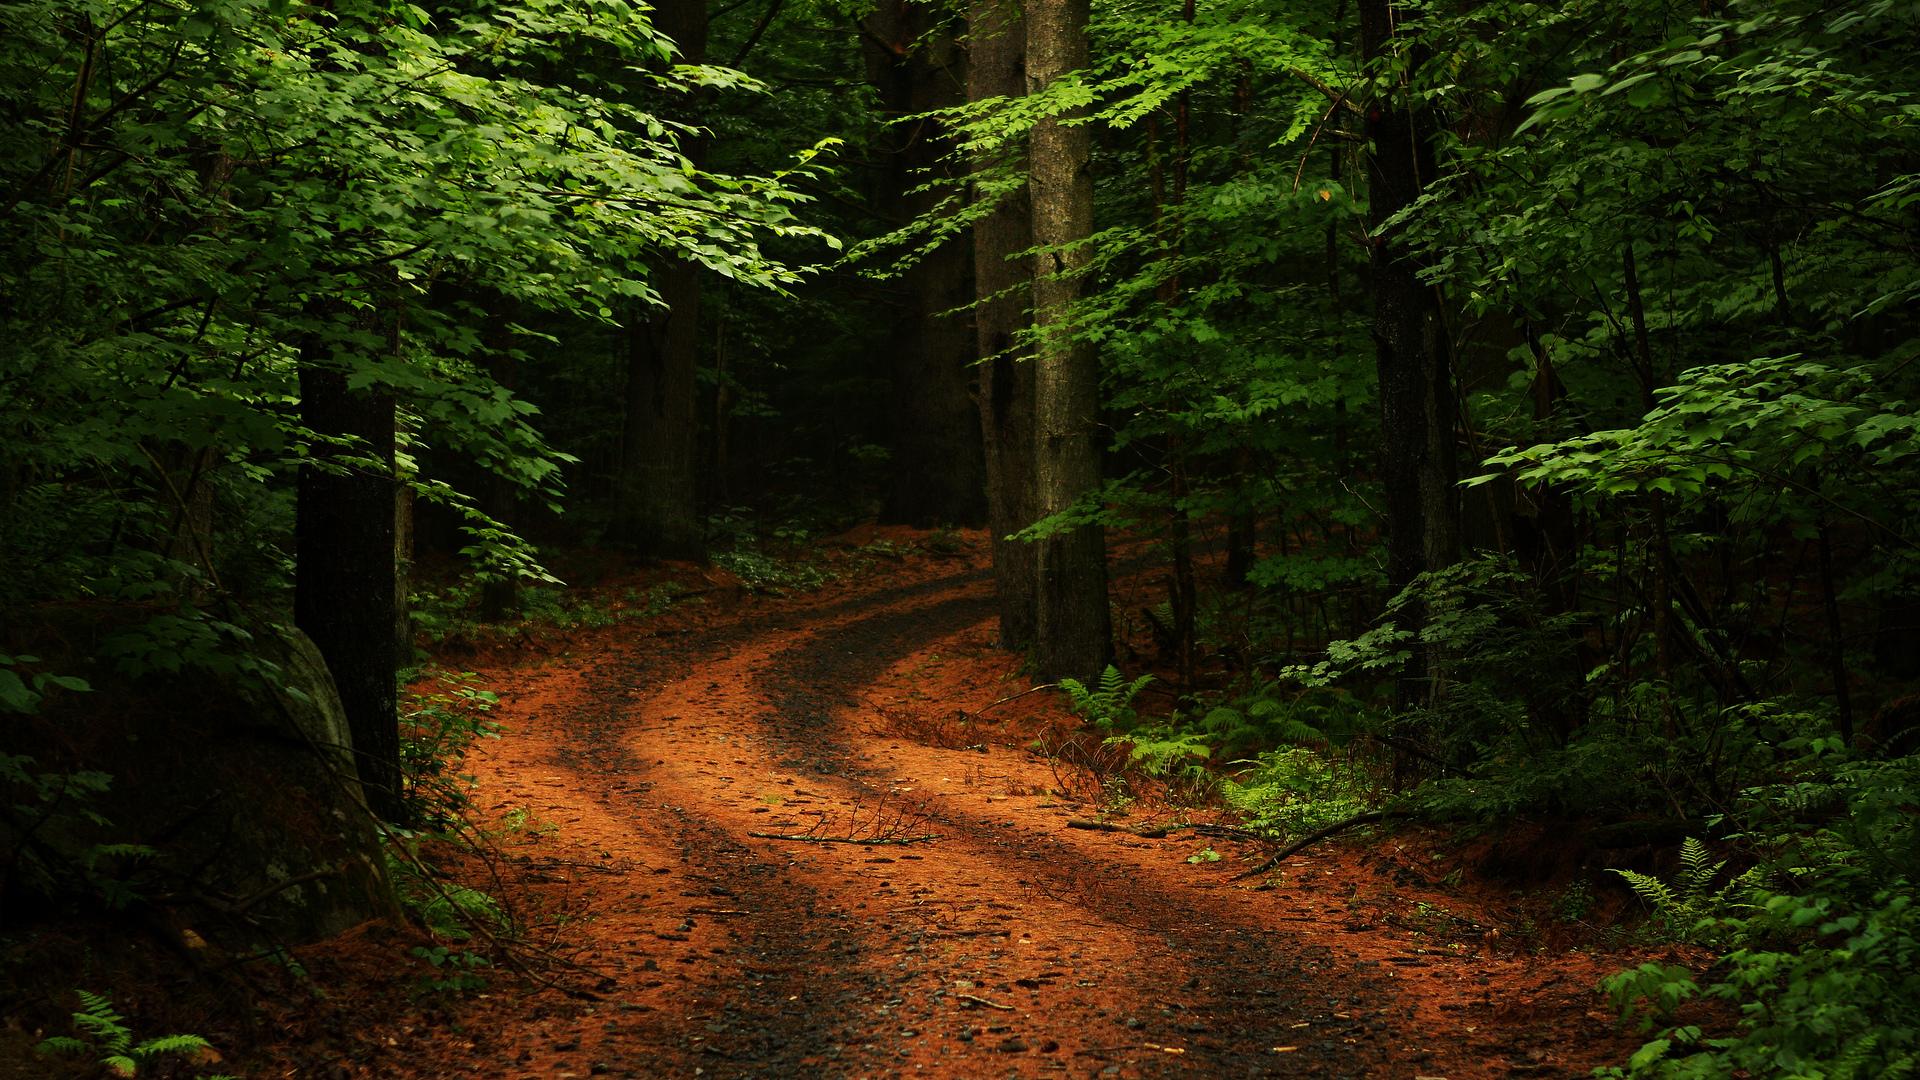 Brown path